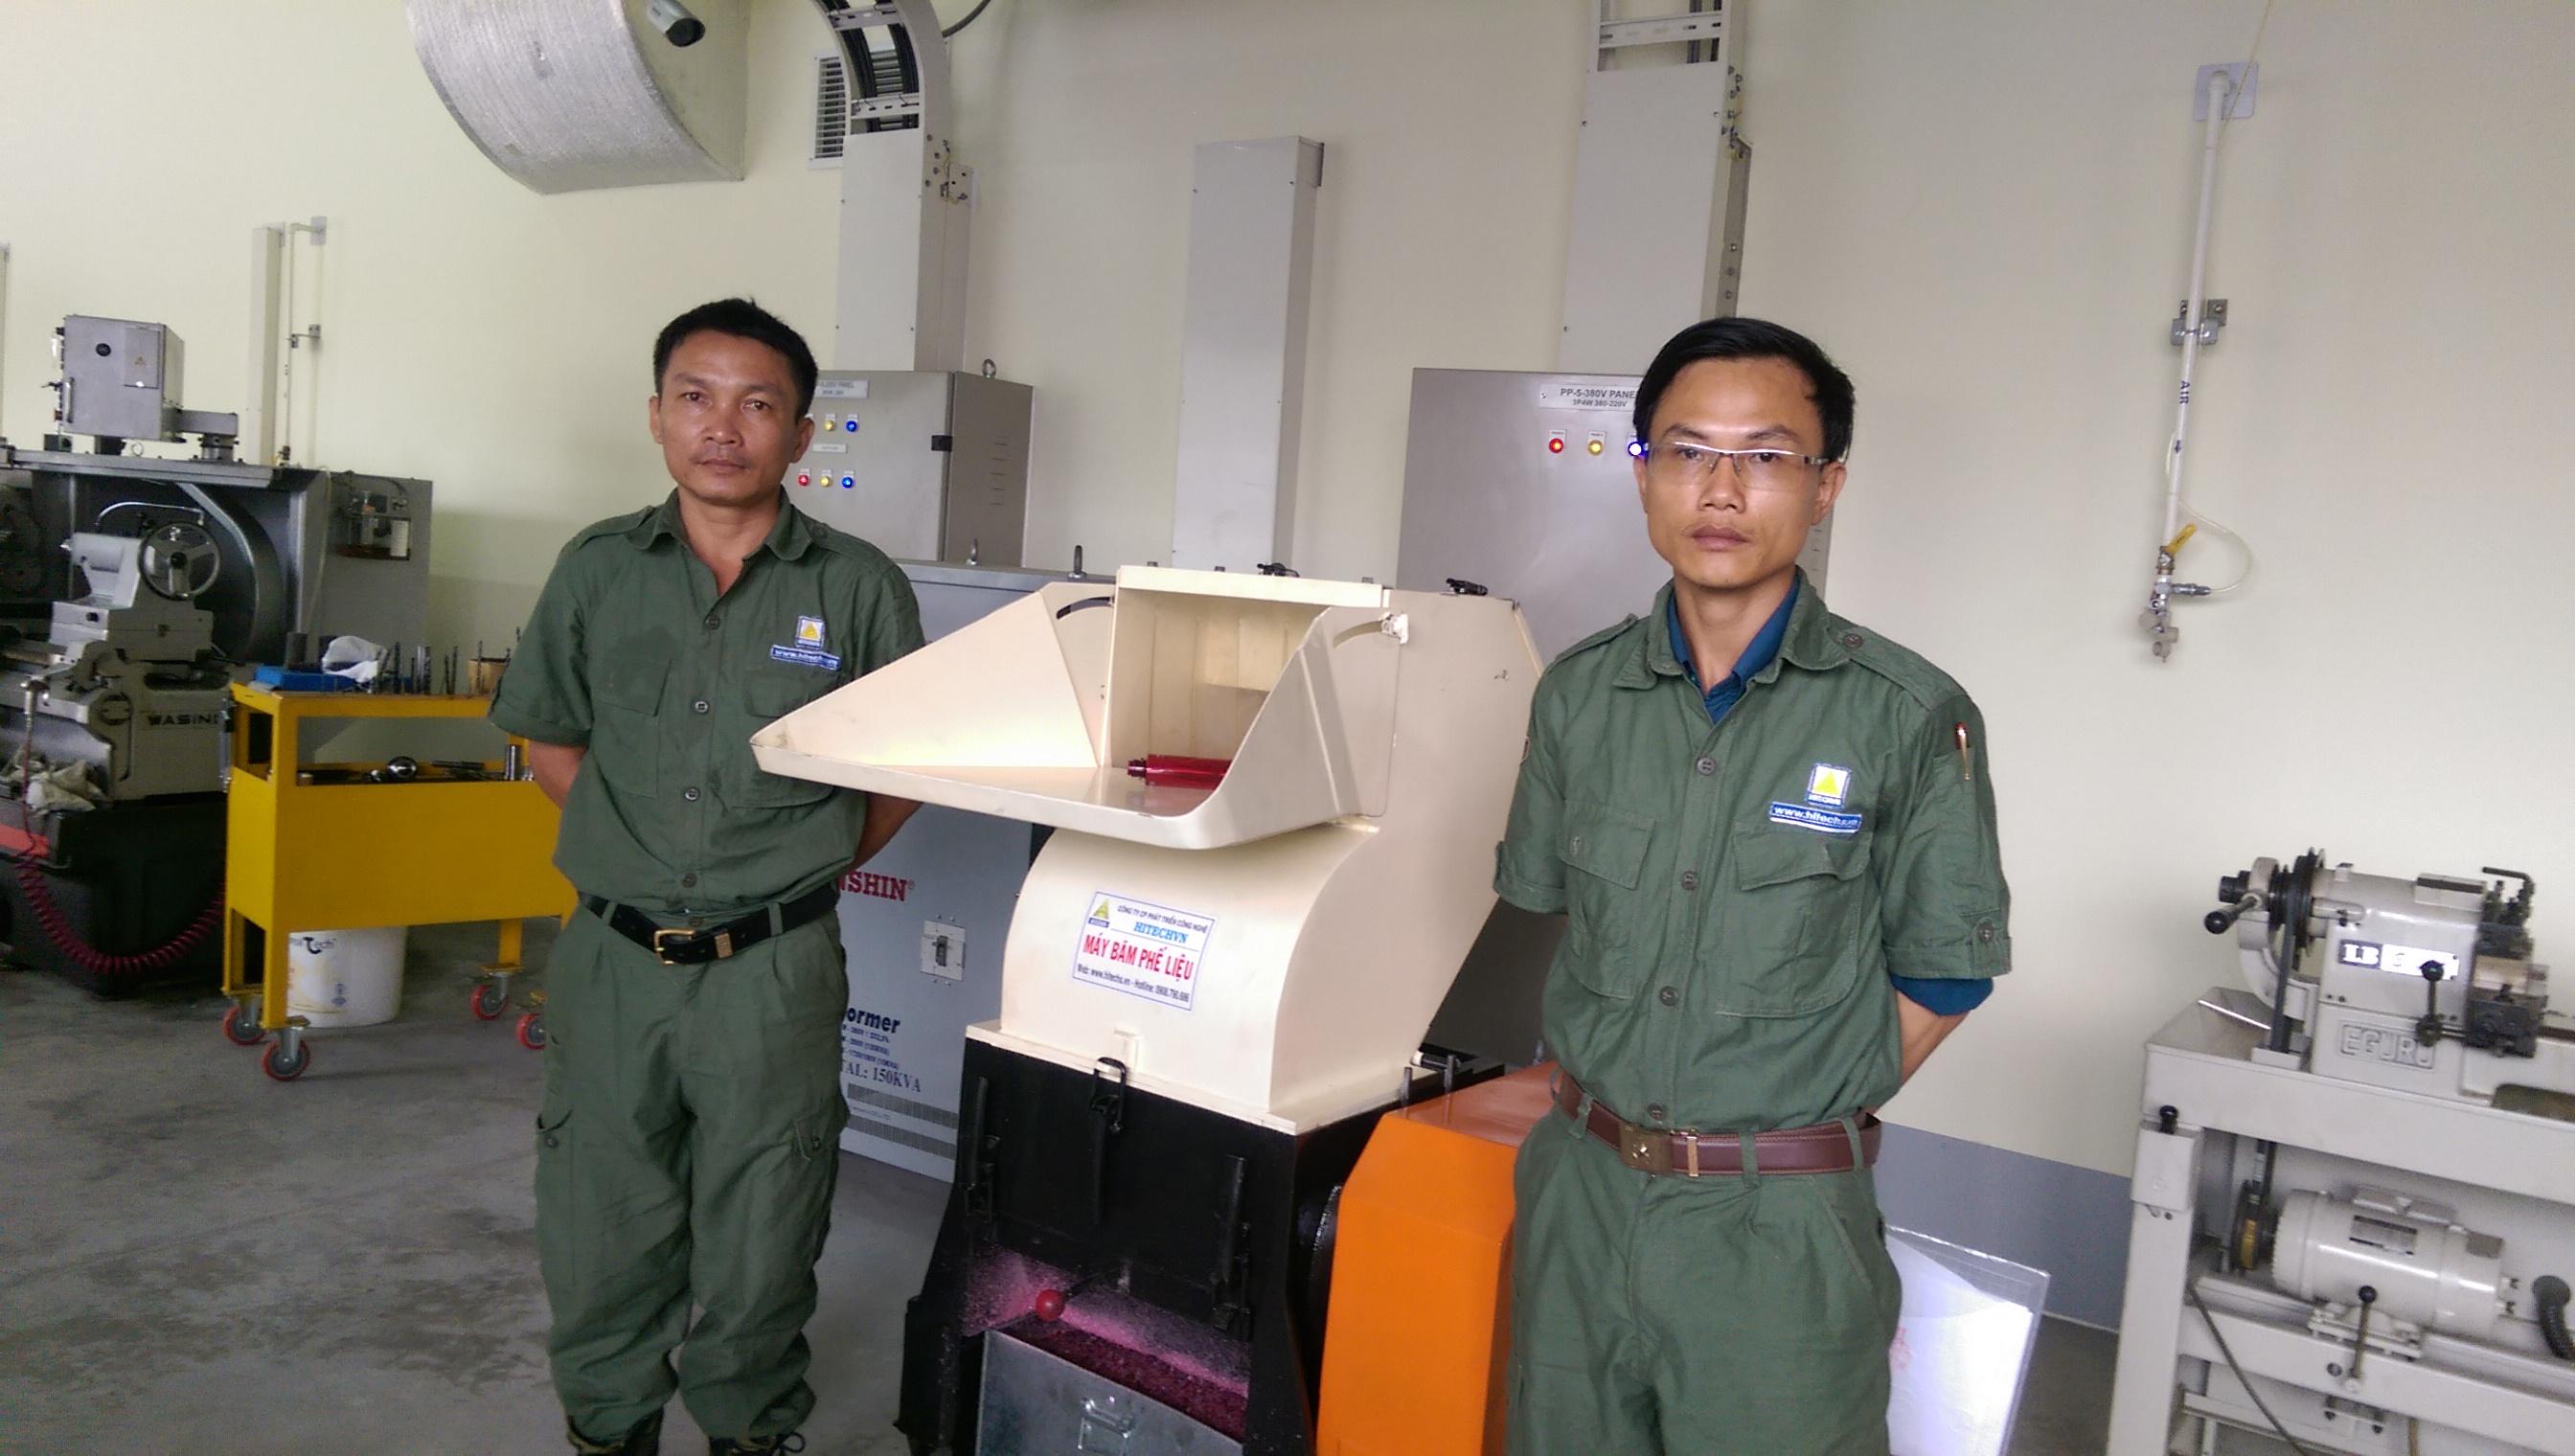 May-nghien-vo-chai-nhua-cung-Hitech-200